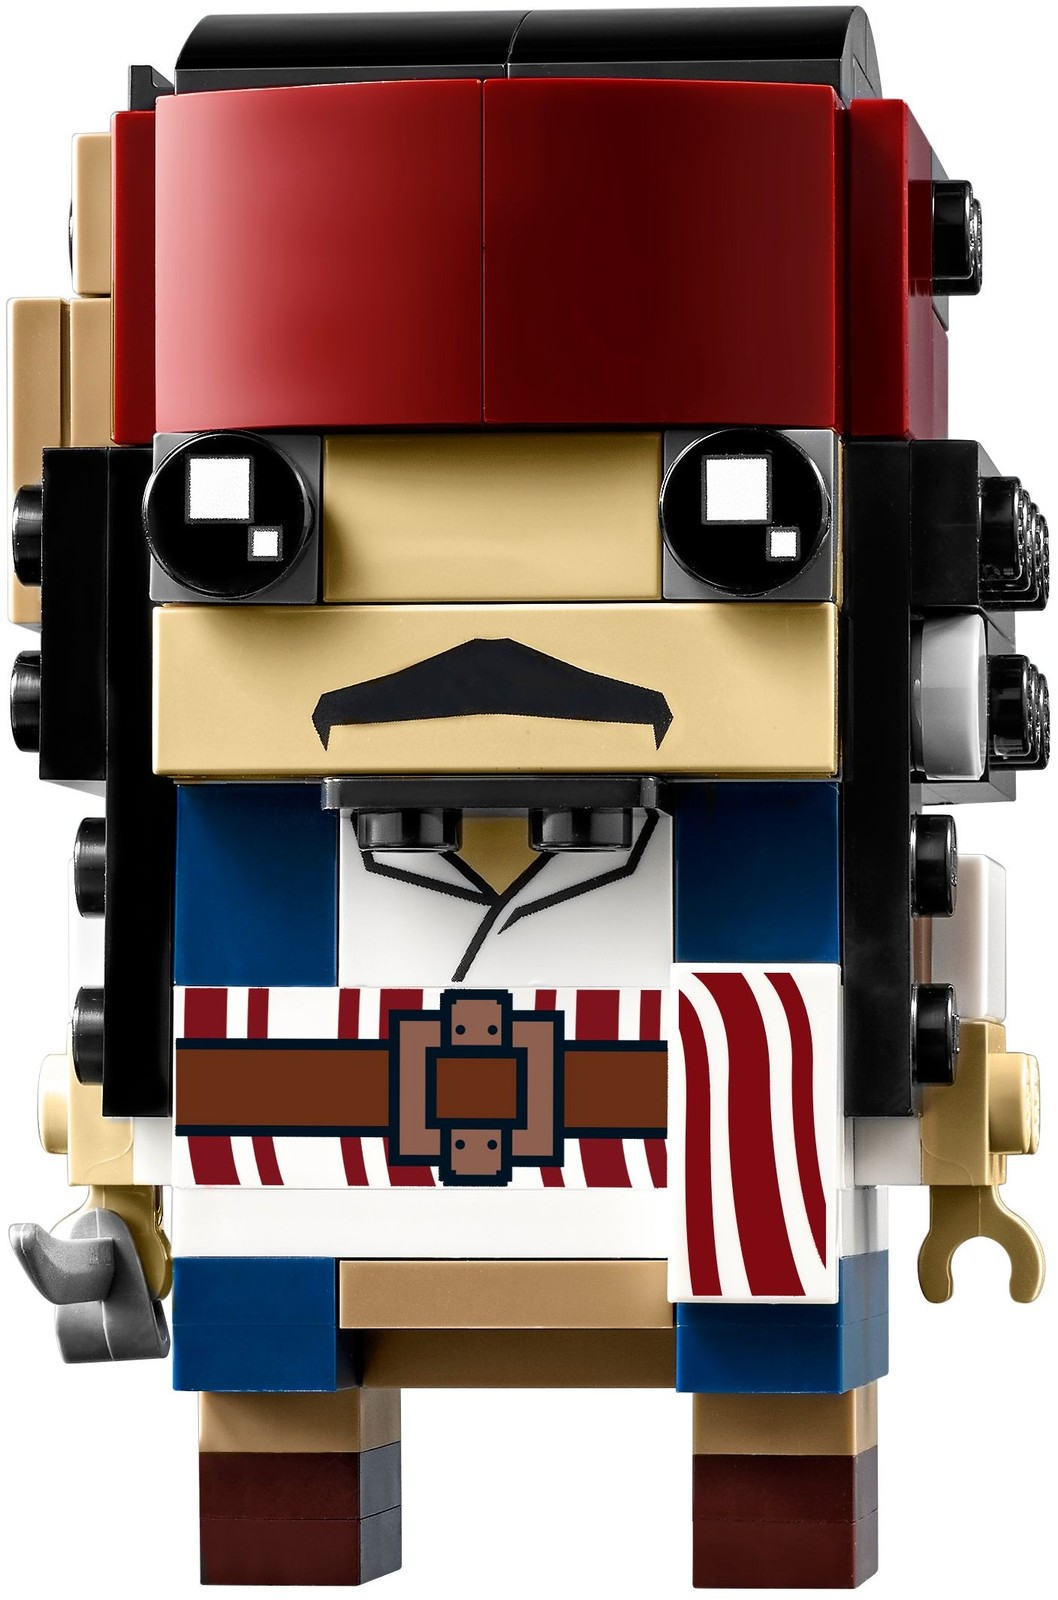 LEGO Brickheadz - Captain Jack Sparrow (41593) image